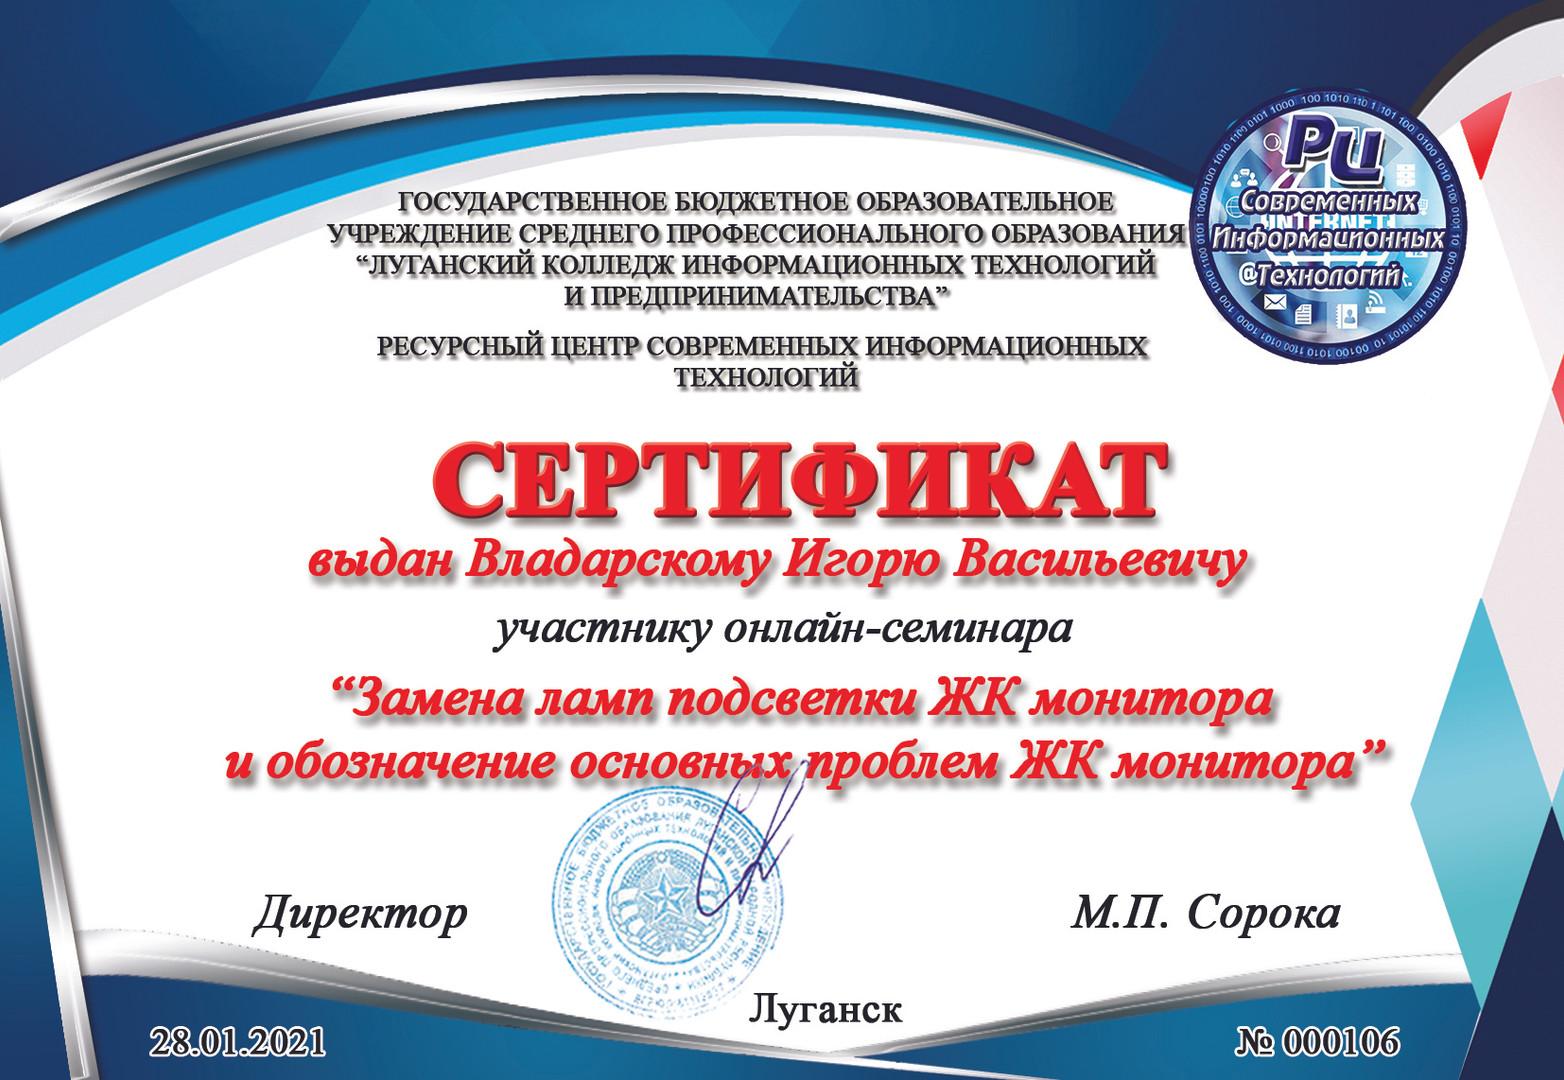 7. Владарский Игорь Васильевич.jpg